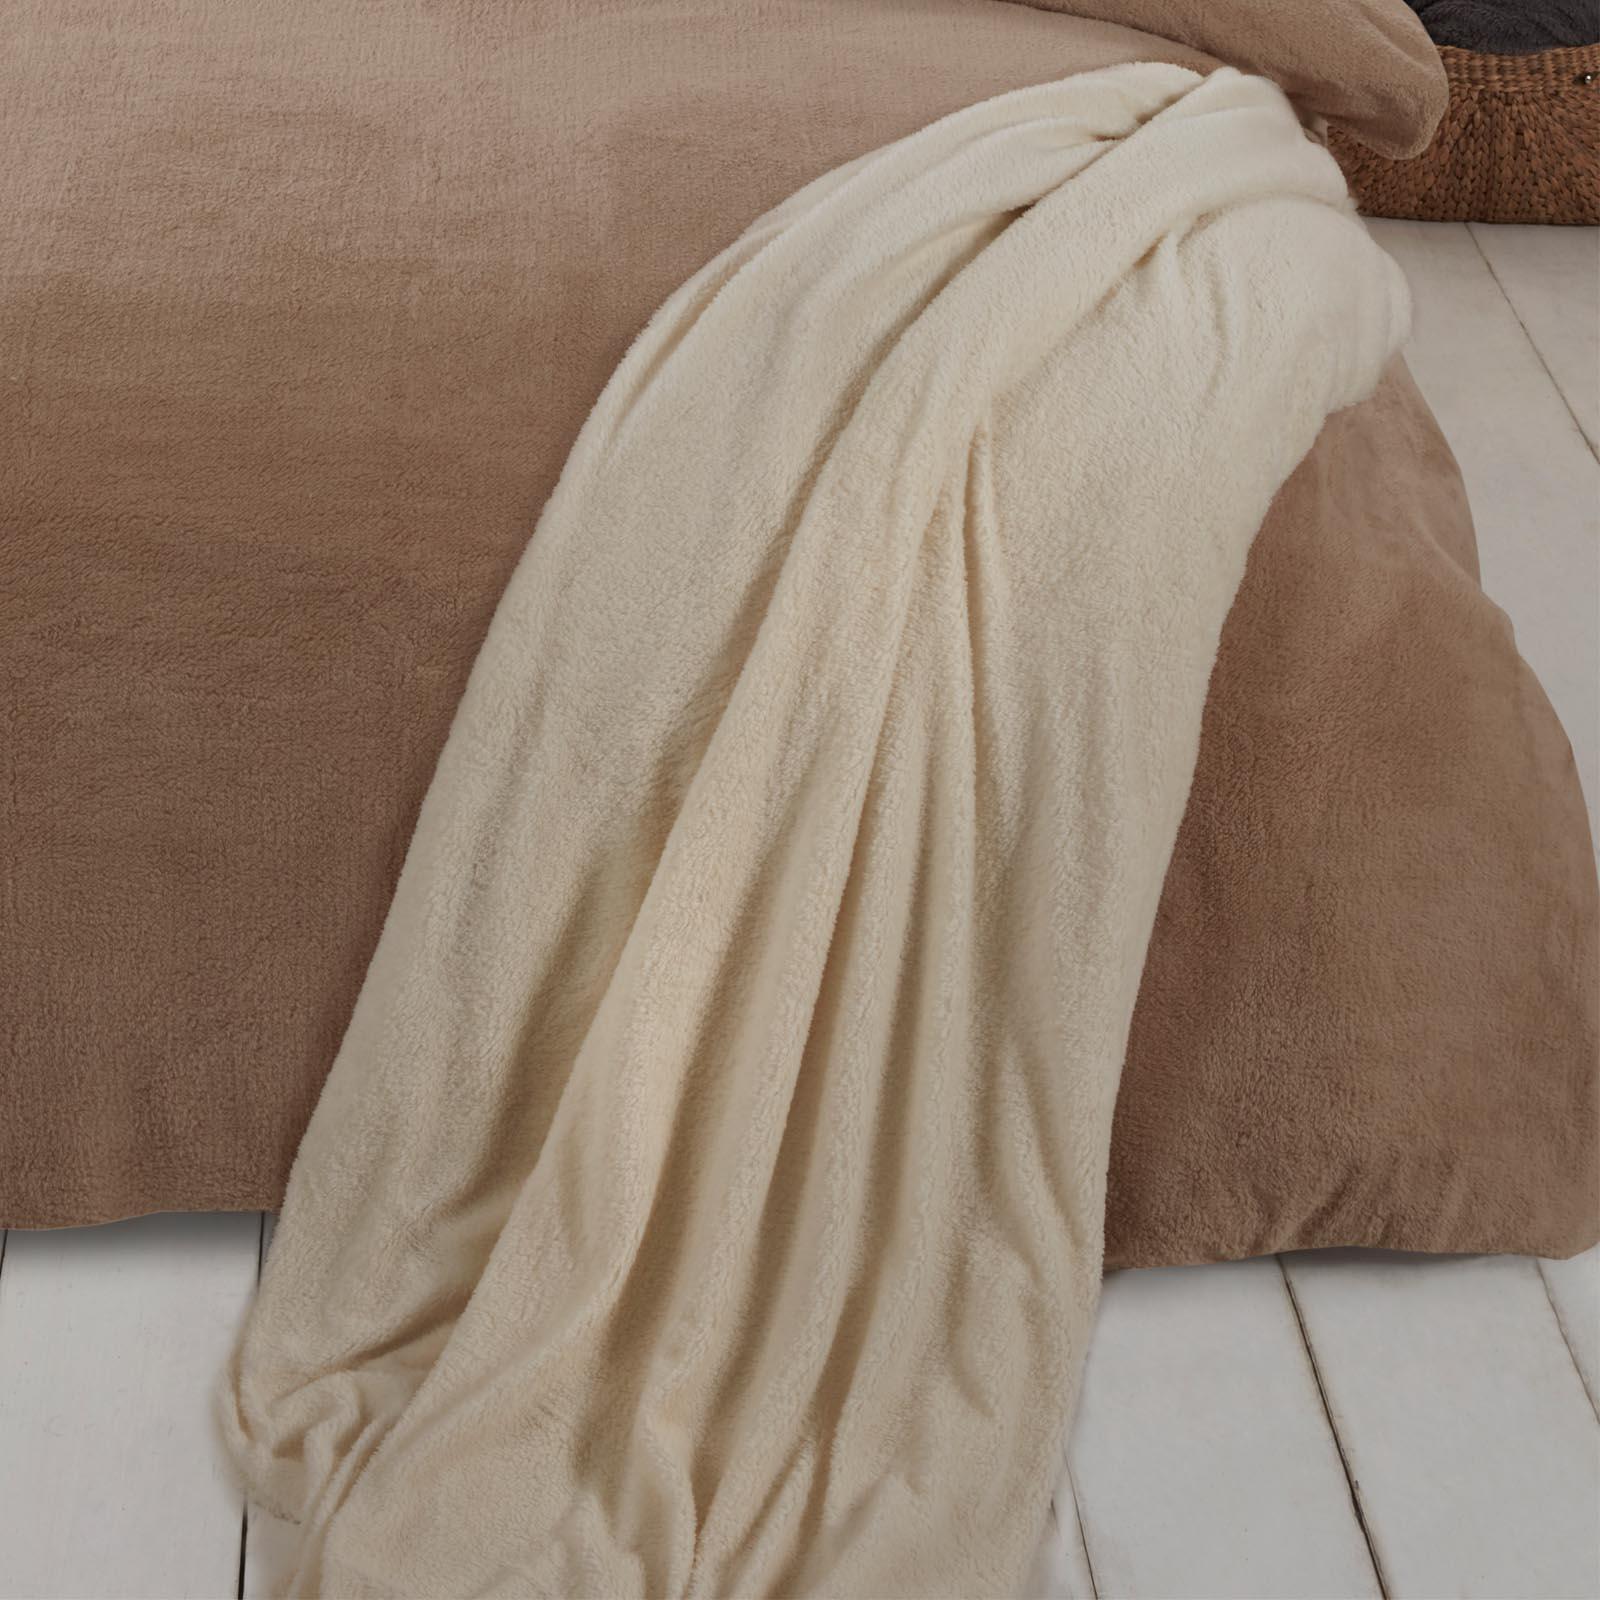 Brentfords-Teddy-Fleece-Bear-Blanket-Large-Throw-Over-Bed-Plush-Soft-Bedspread thumbnail 15